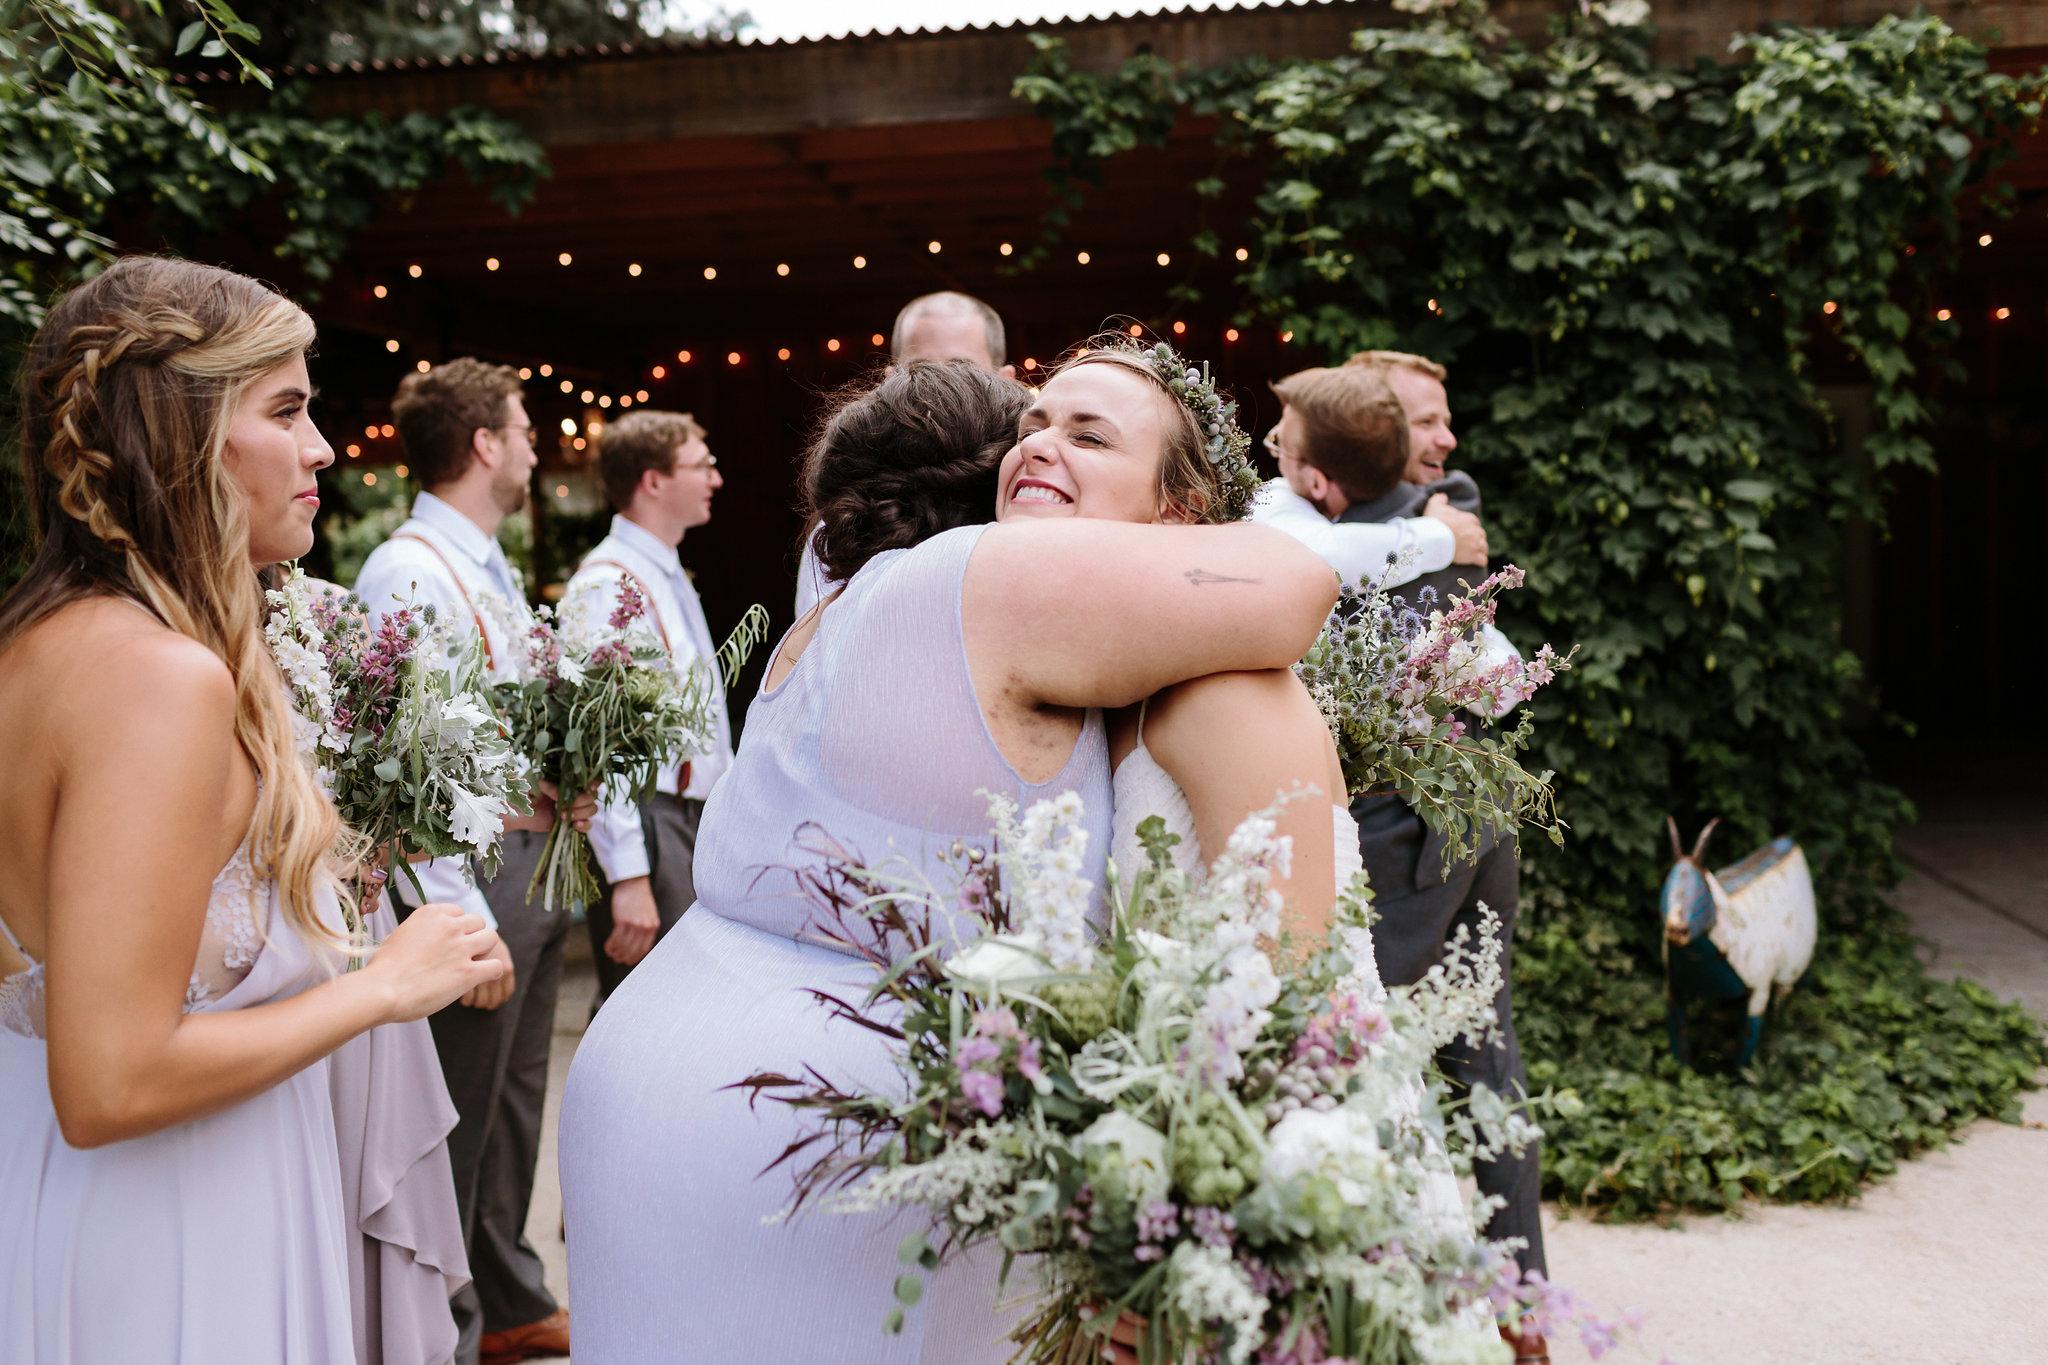 Tips to plan a wedding with an autoimmune disease